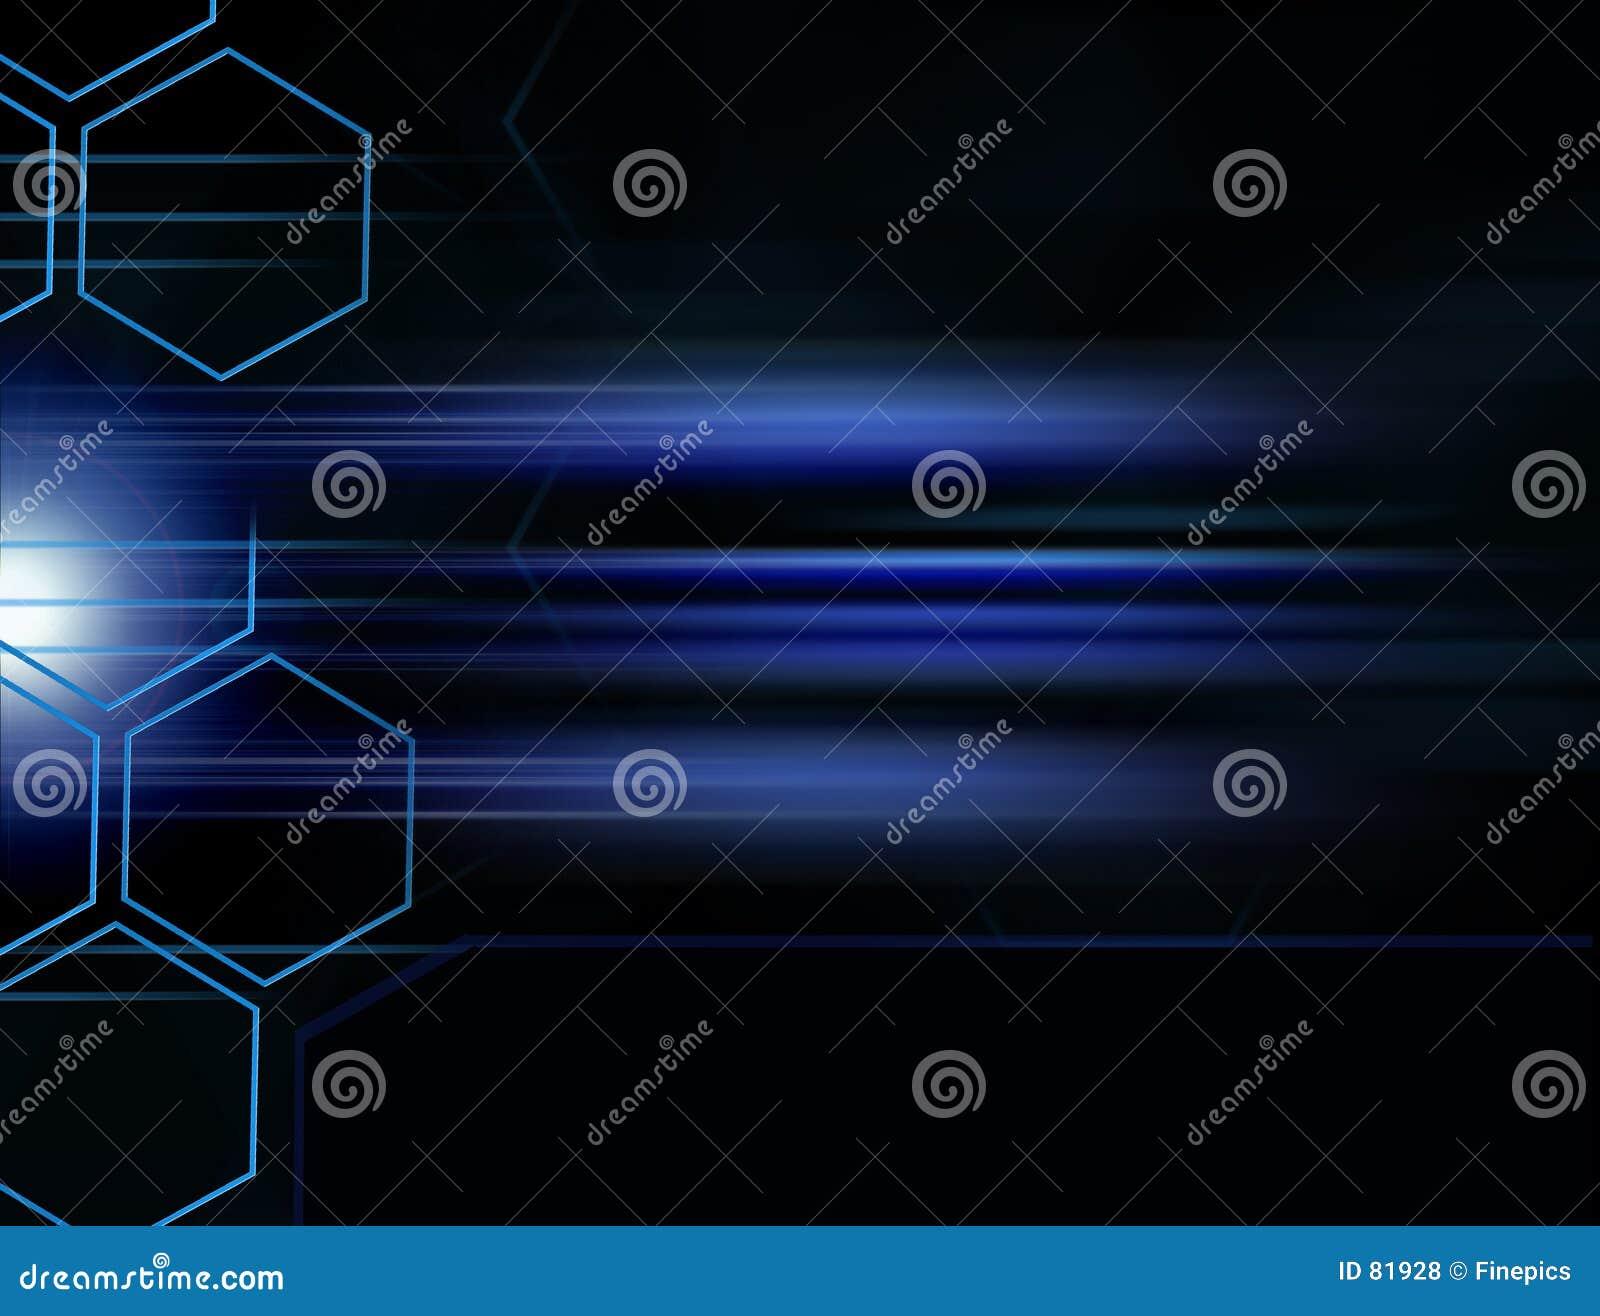 Digital Background Grid Royalty Free Stock Photos